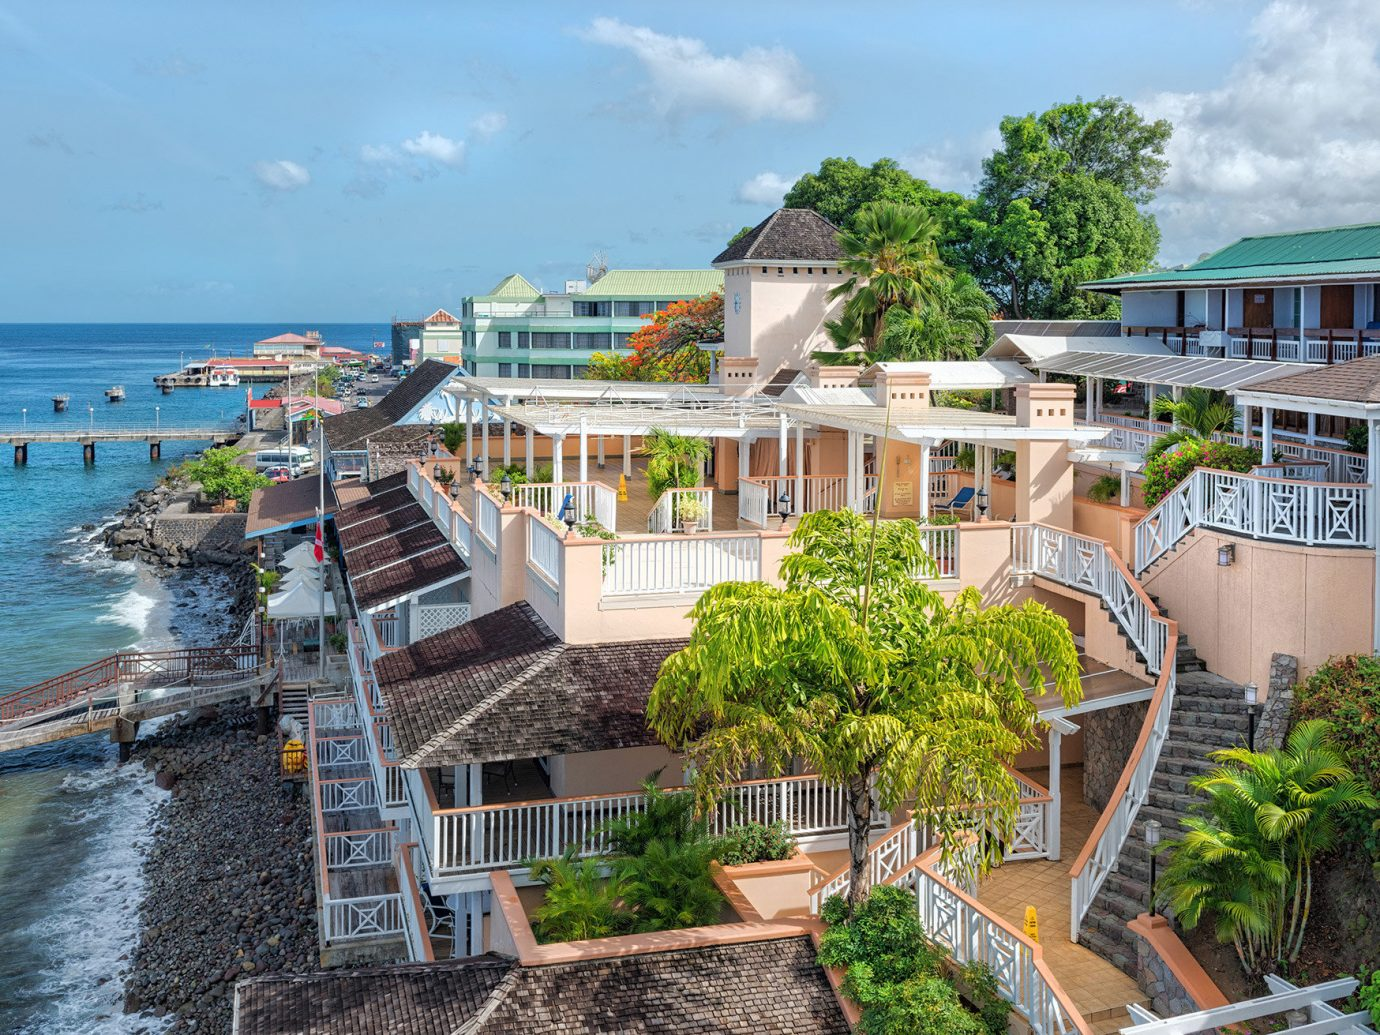 Trip Ideas sky outdoor property Town vacation Resort Coast tourism estate Sea Village bay caribbean several